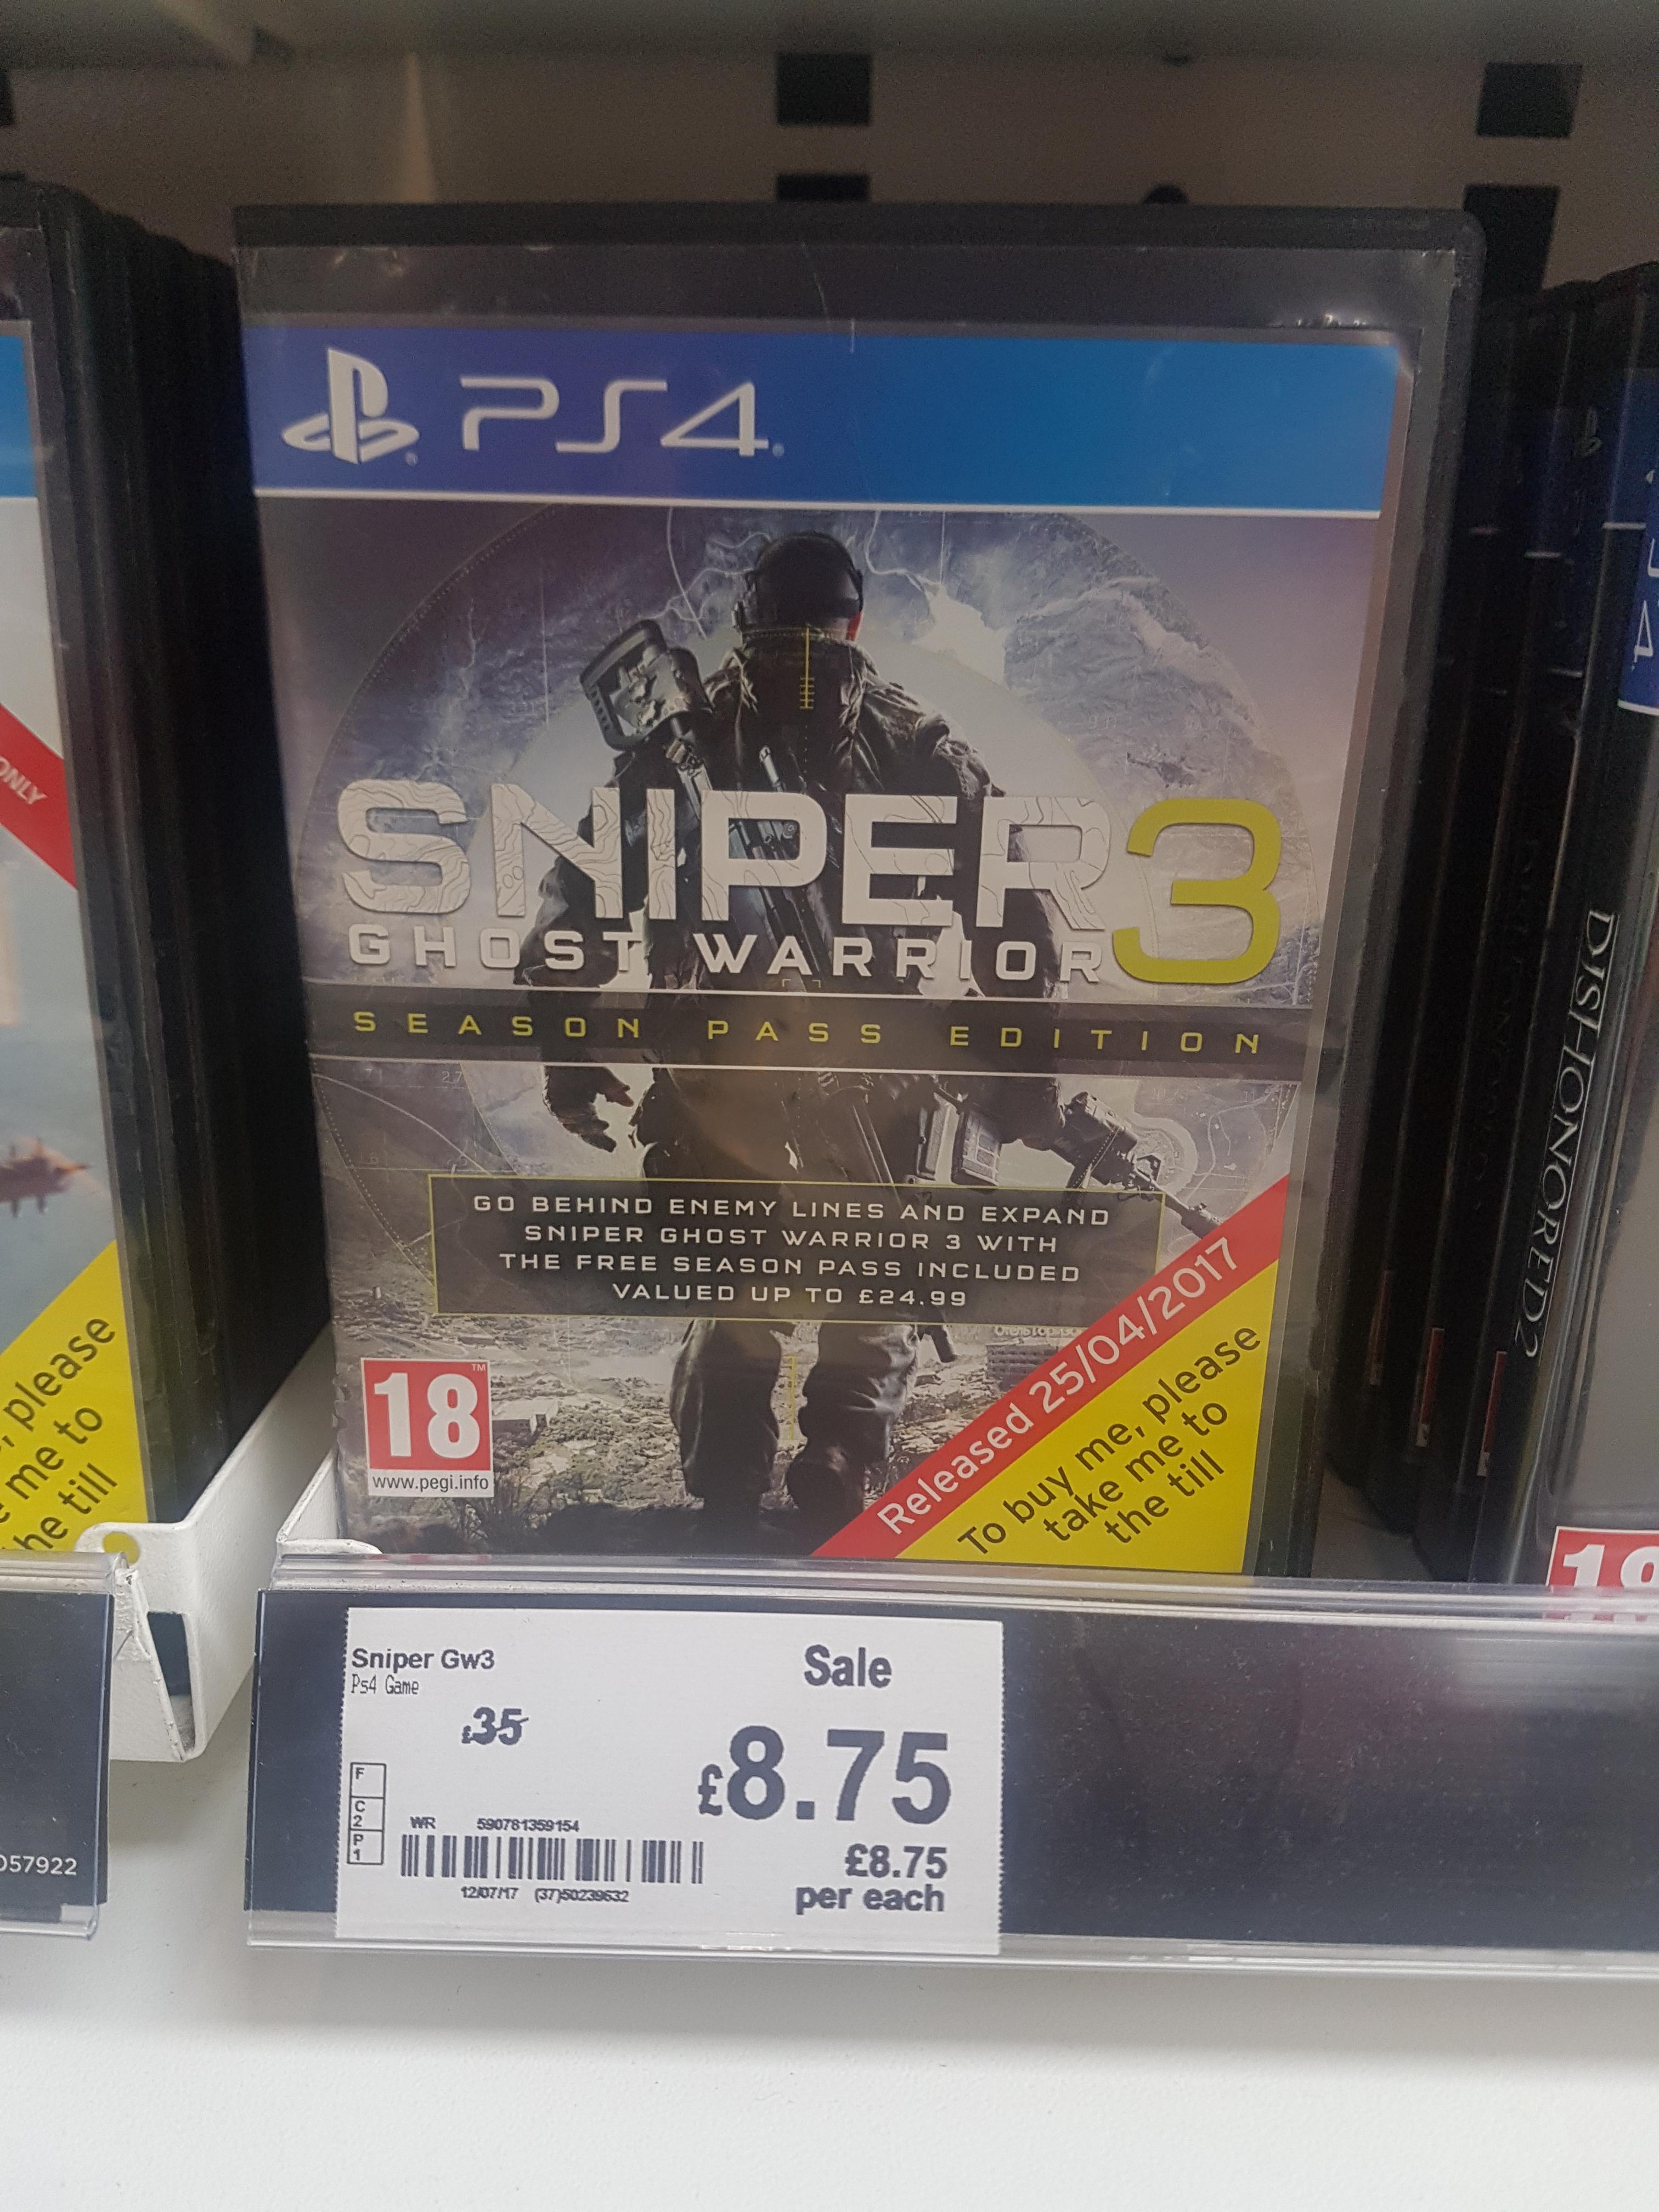 Sniper 3 ps4 - £8.75  Found at asda Tunbridge wells